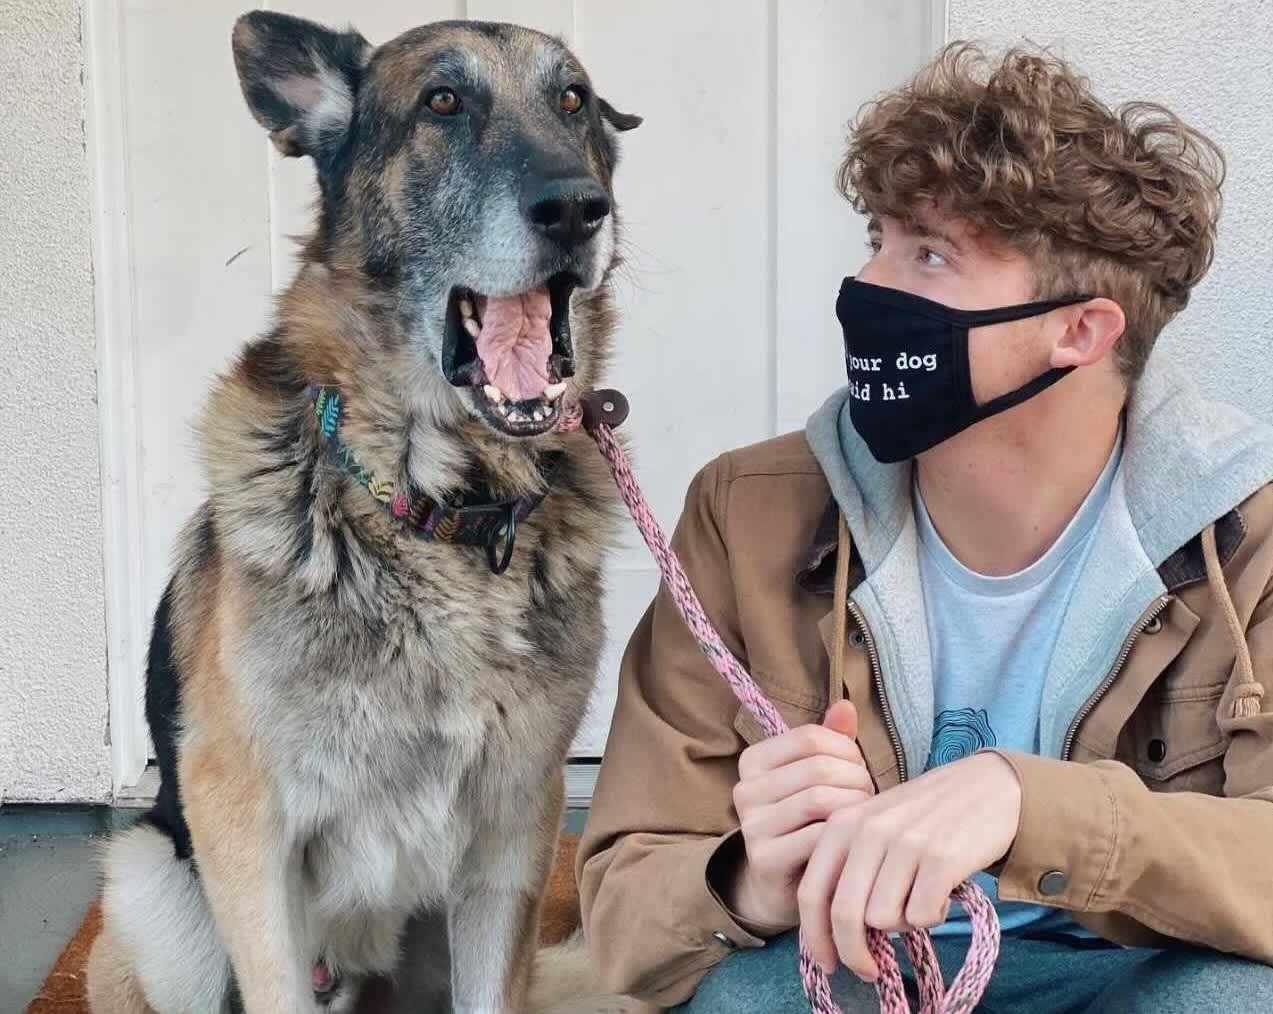 dogs nelson matt teen chico